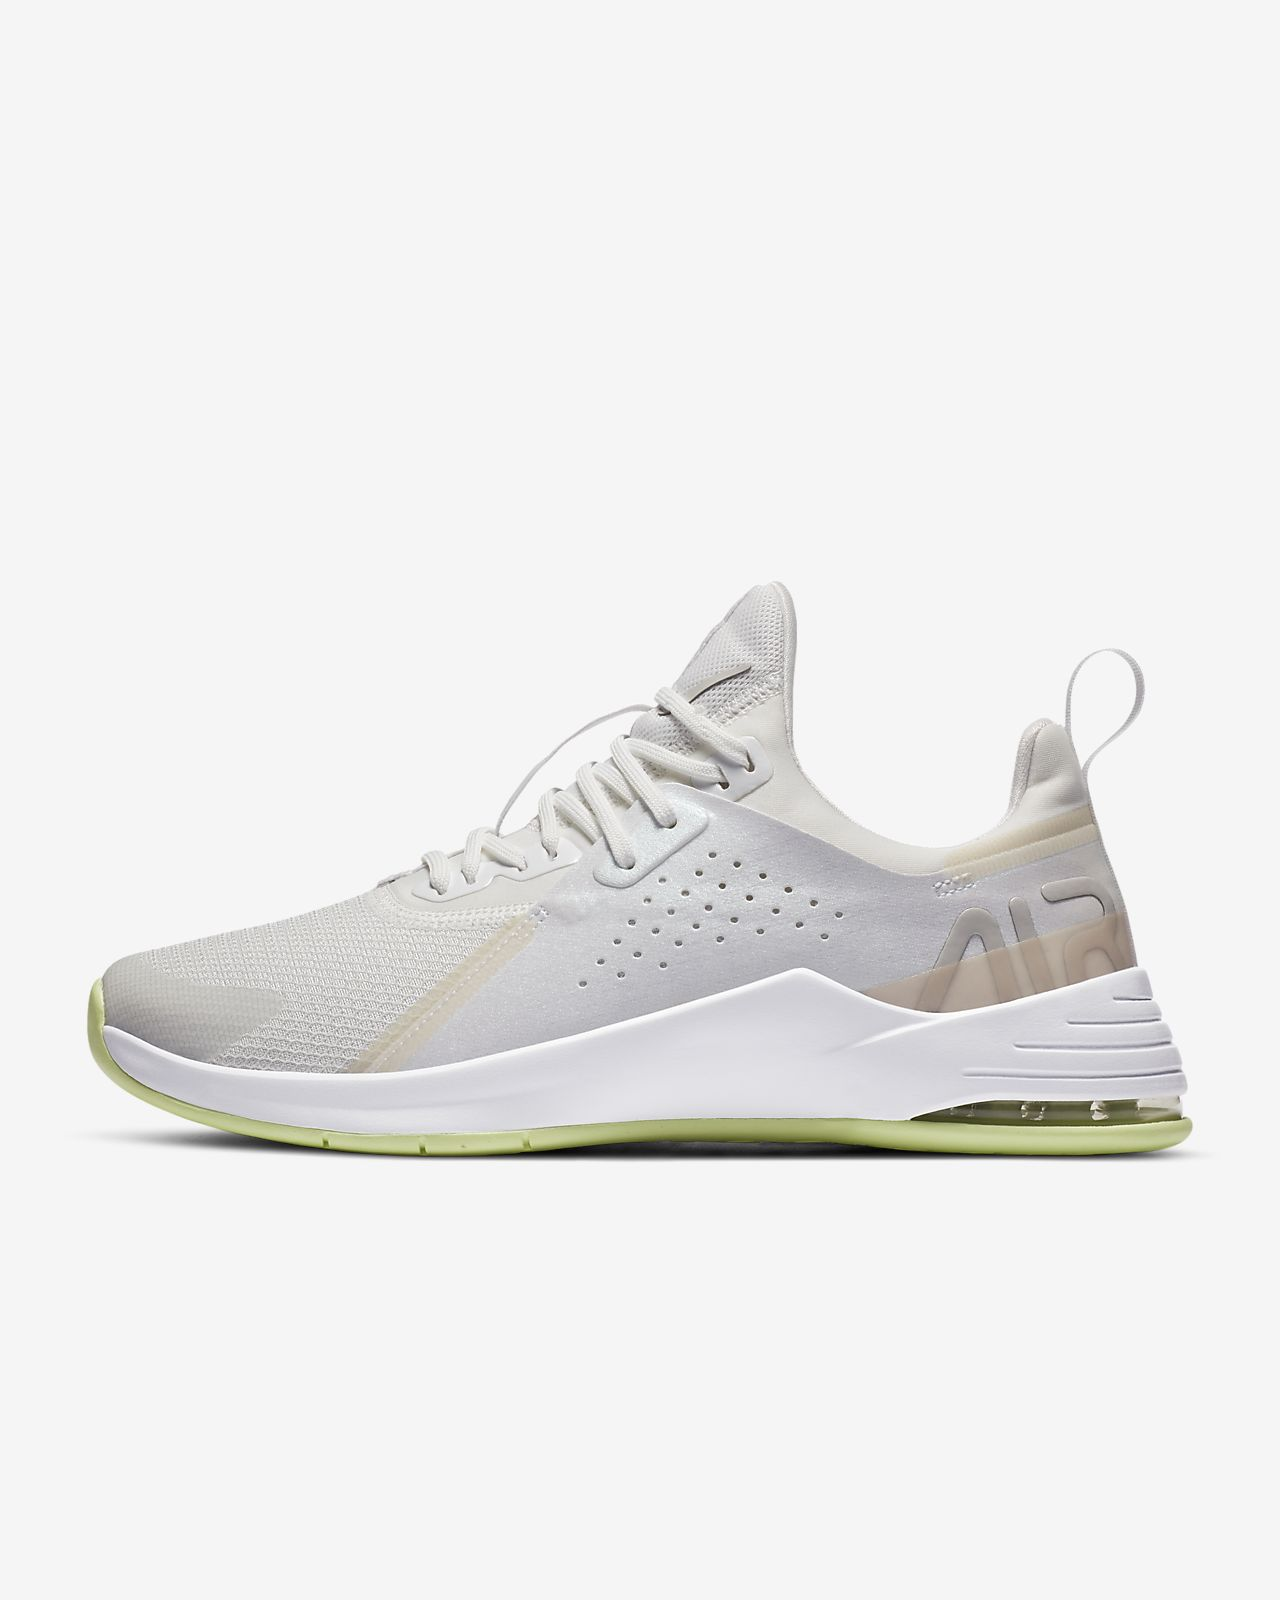 Chaussure de training Nike Air Max Bella TR 3 Premium pour Femme